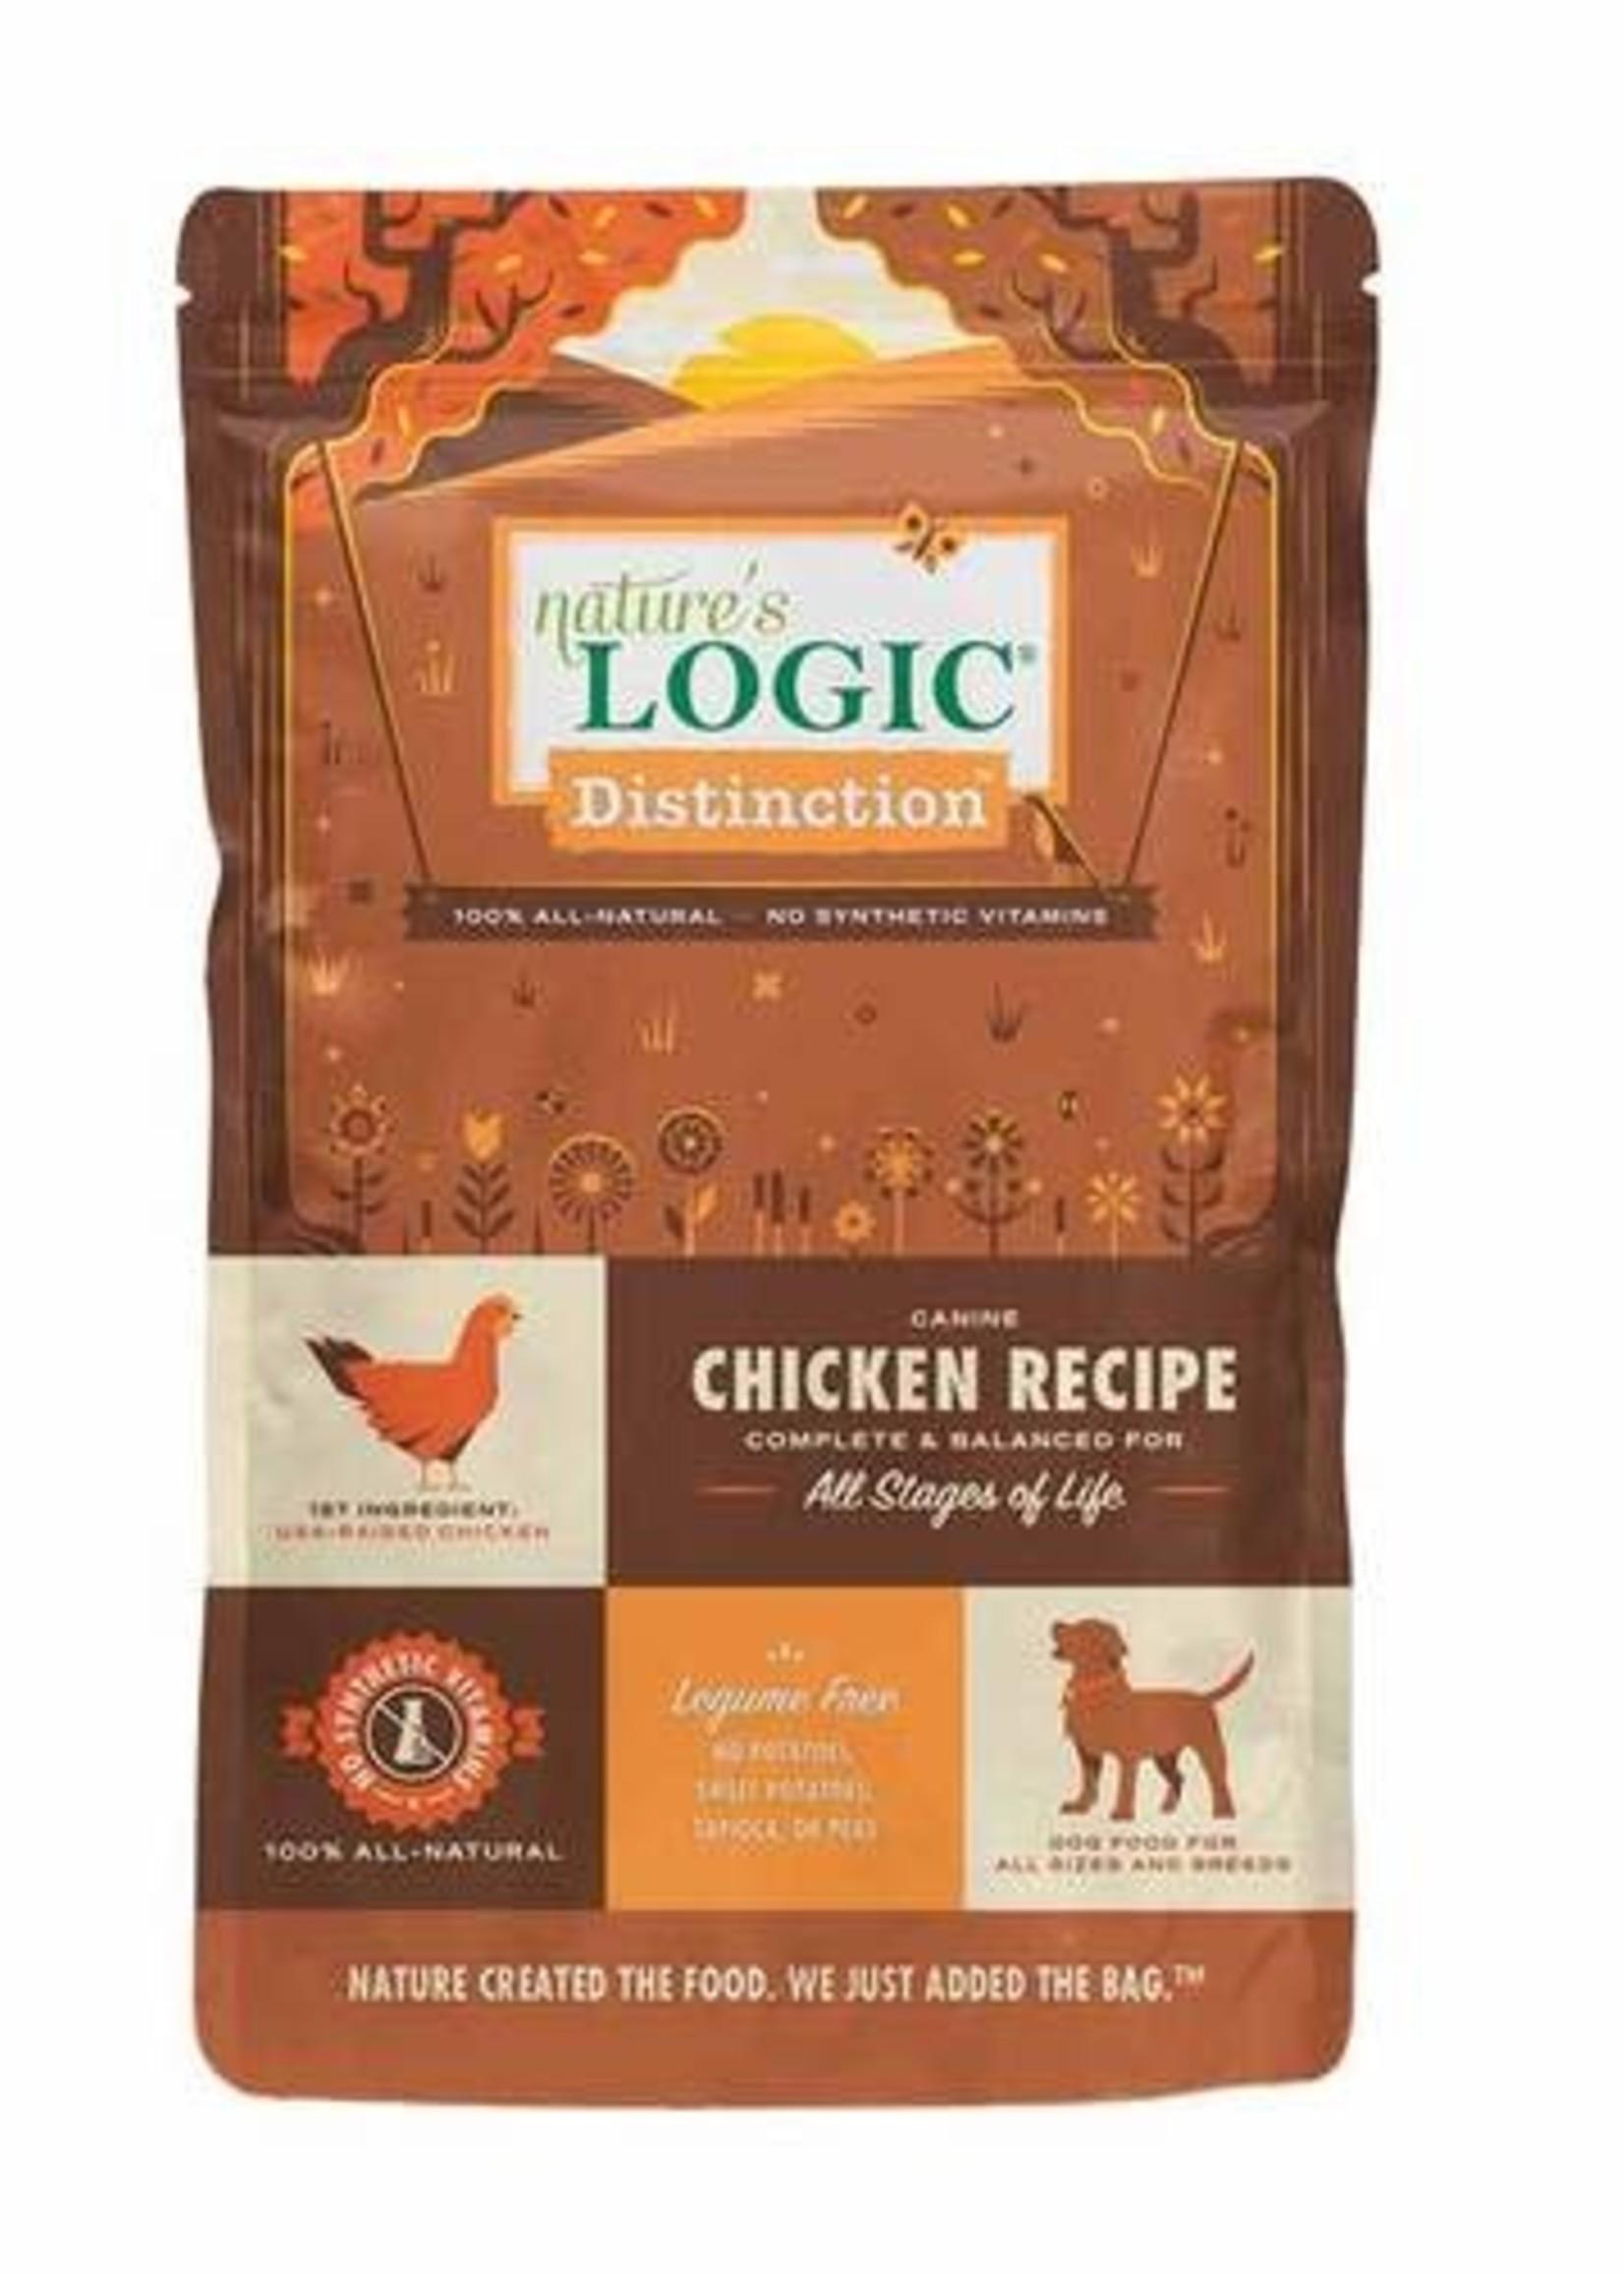 Nature's Logic Distinction Dog Food - Chicken - 24lb